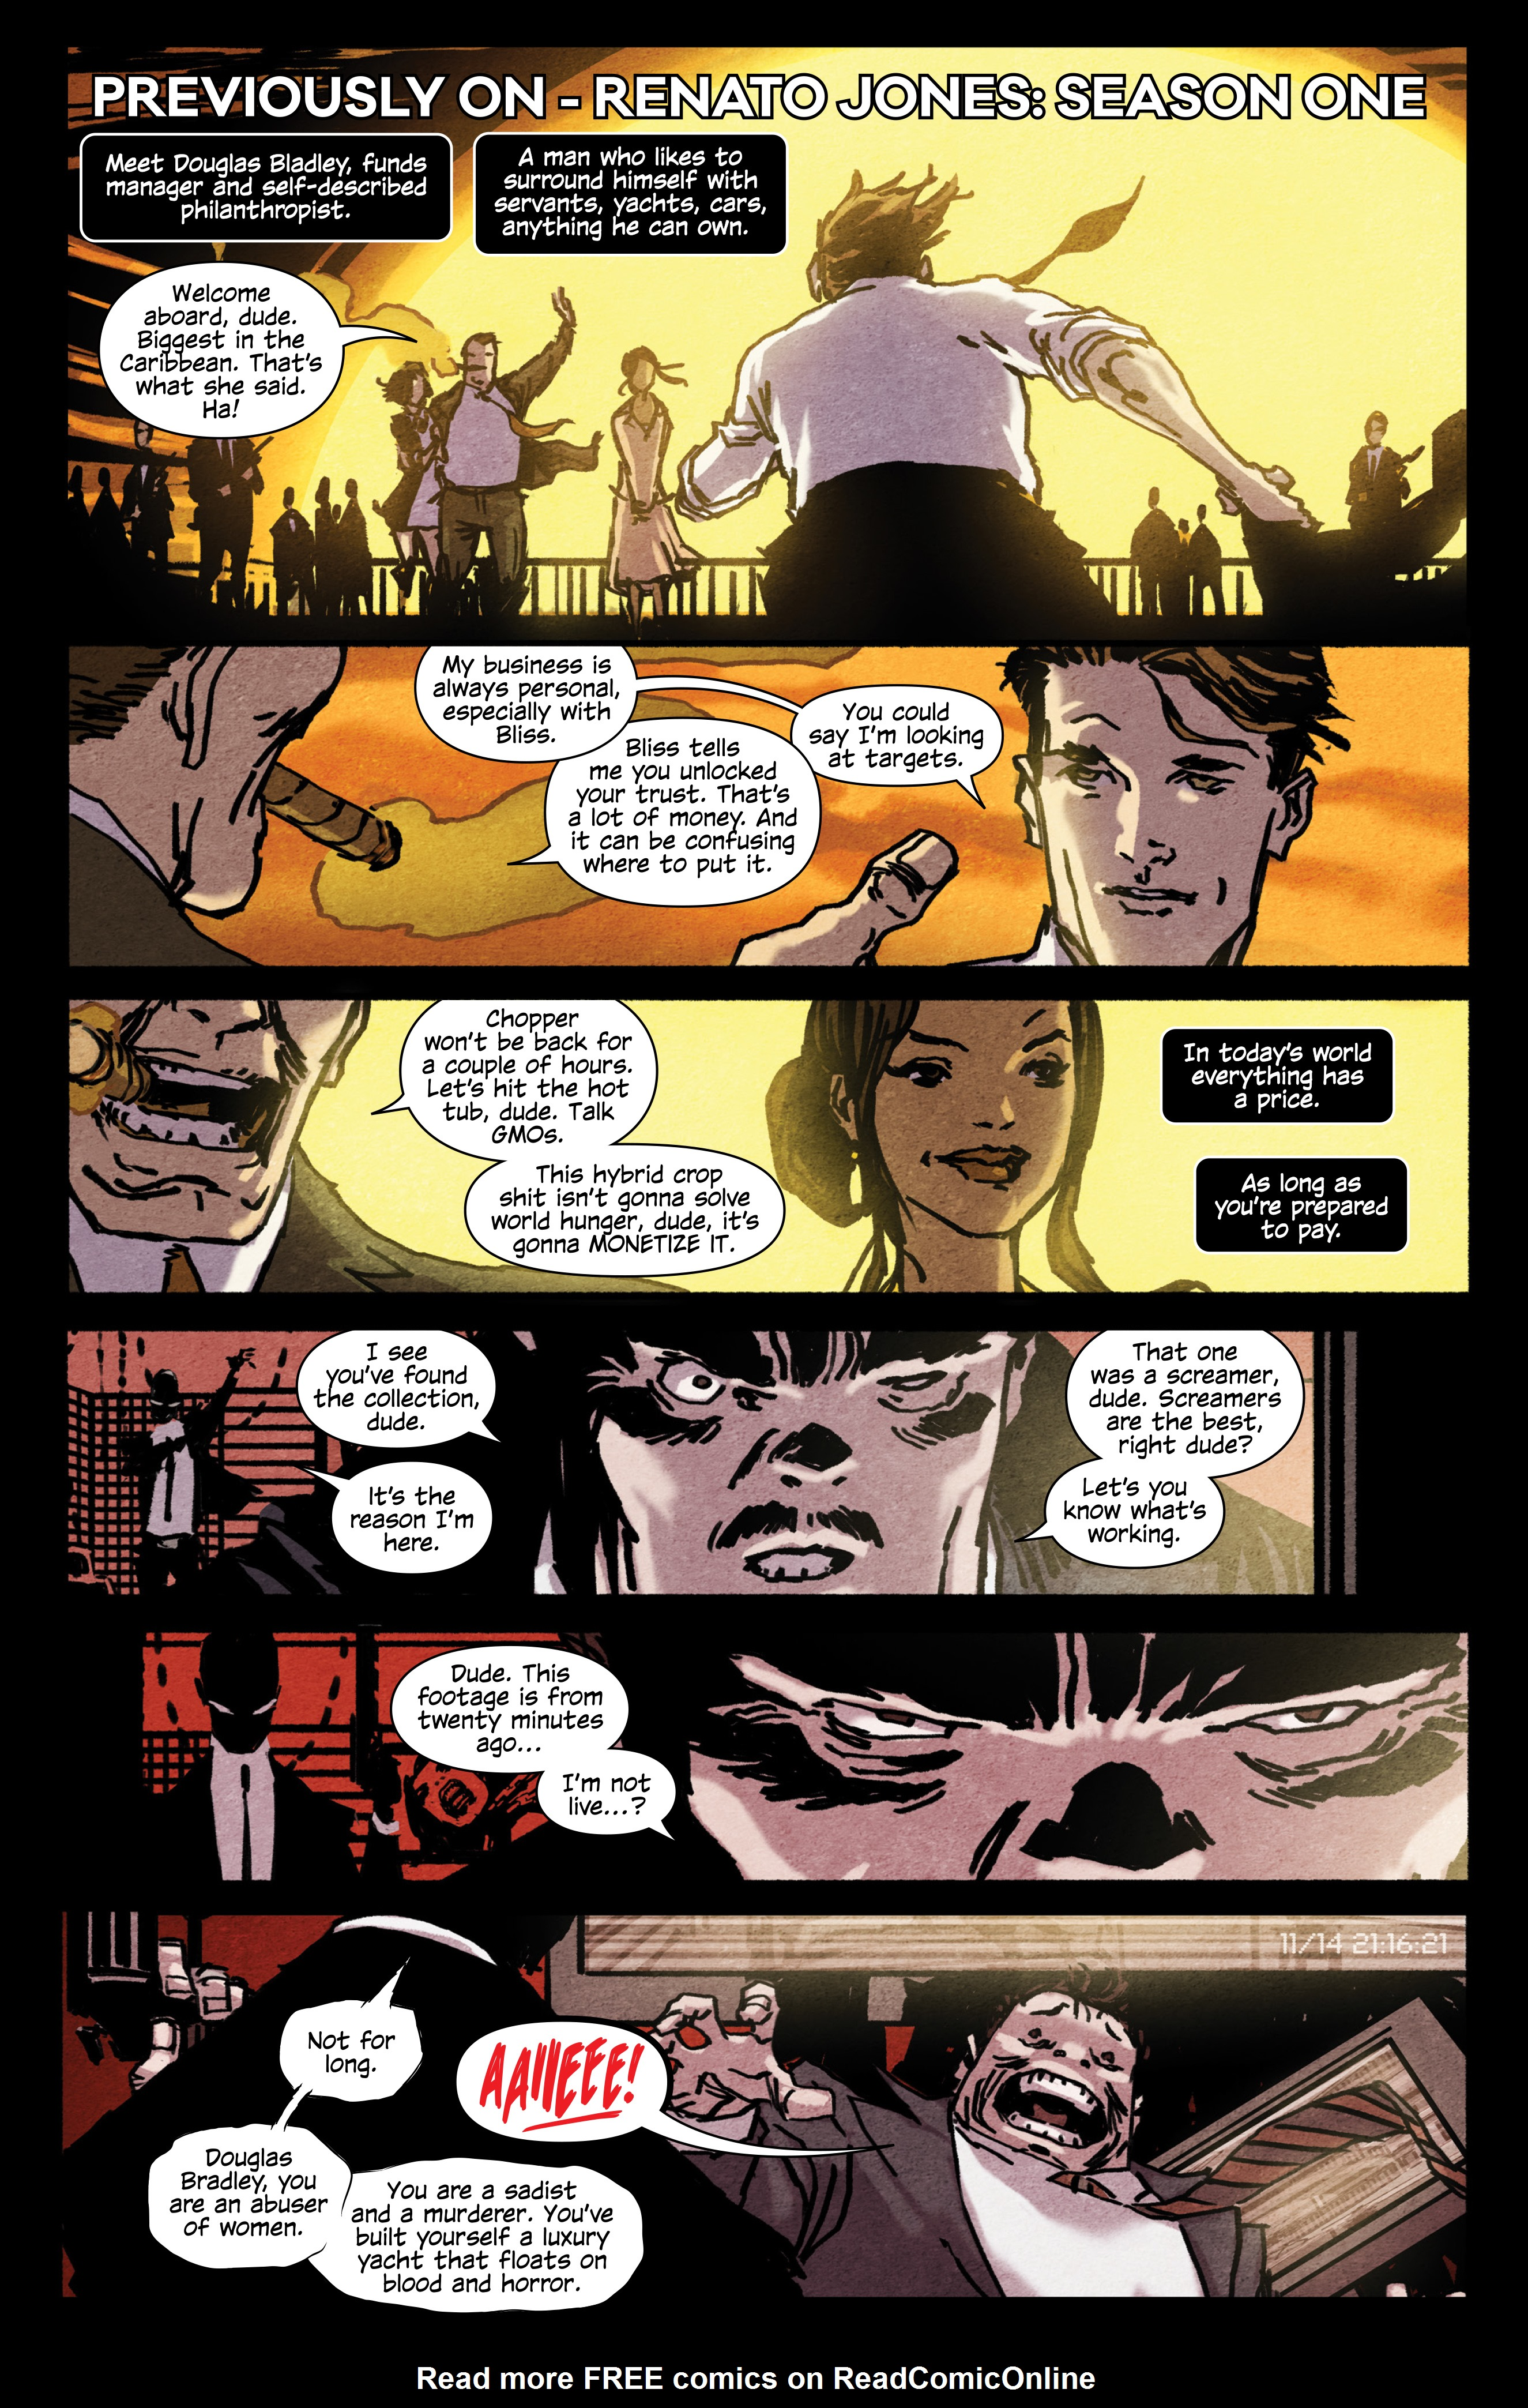 Read online Renato Jones, Season 2: Freelancer comic -  Issue #1 - 4